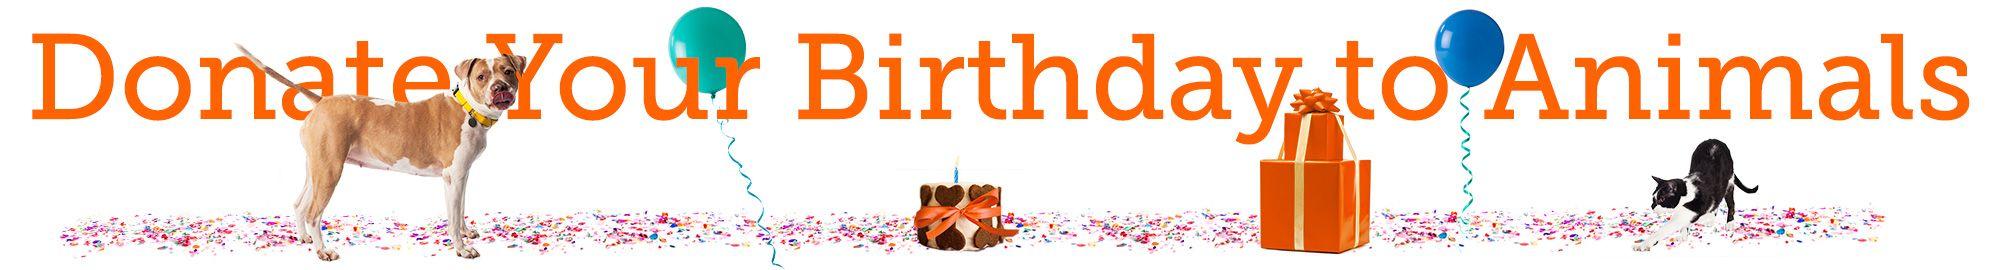 ASPCA Birthday Campaign